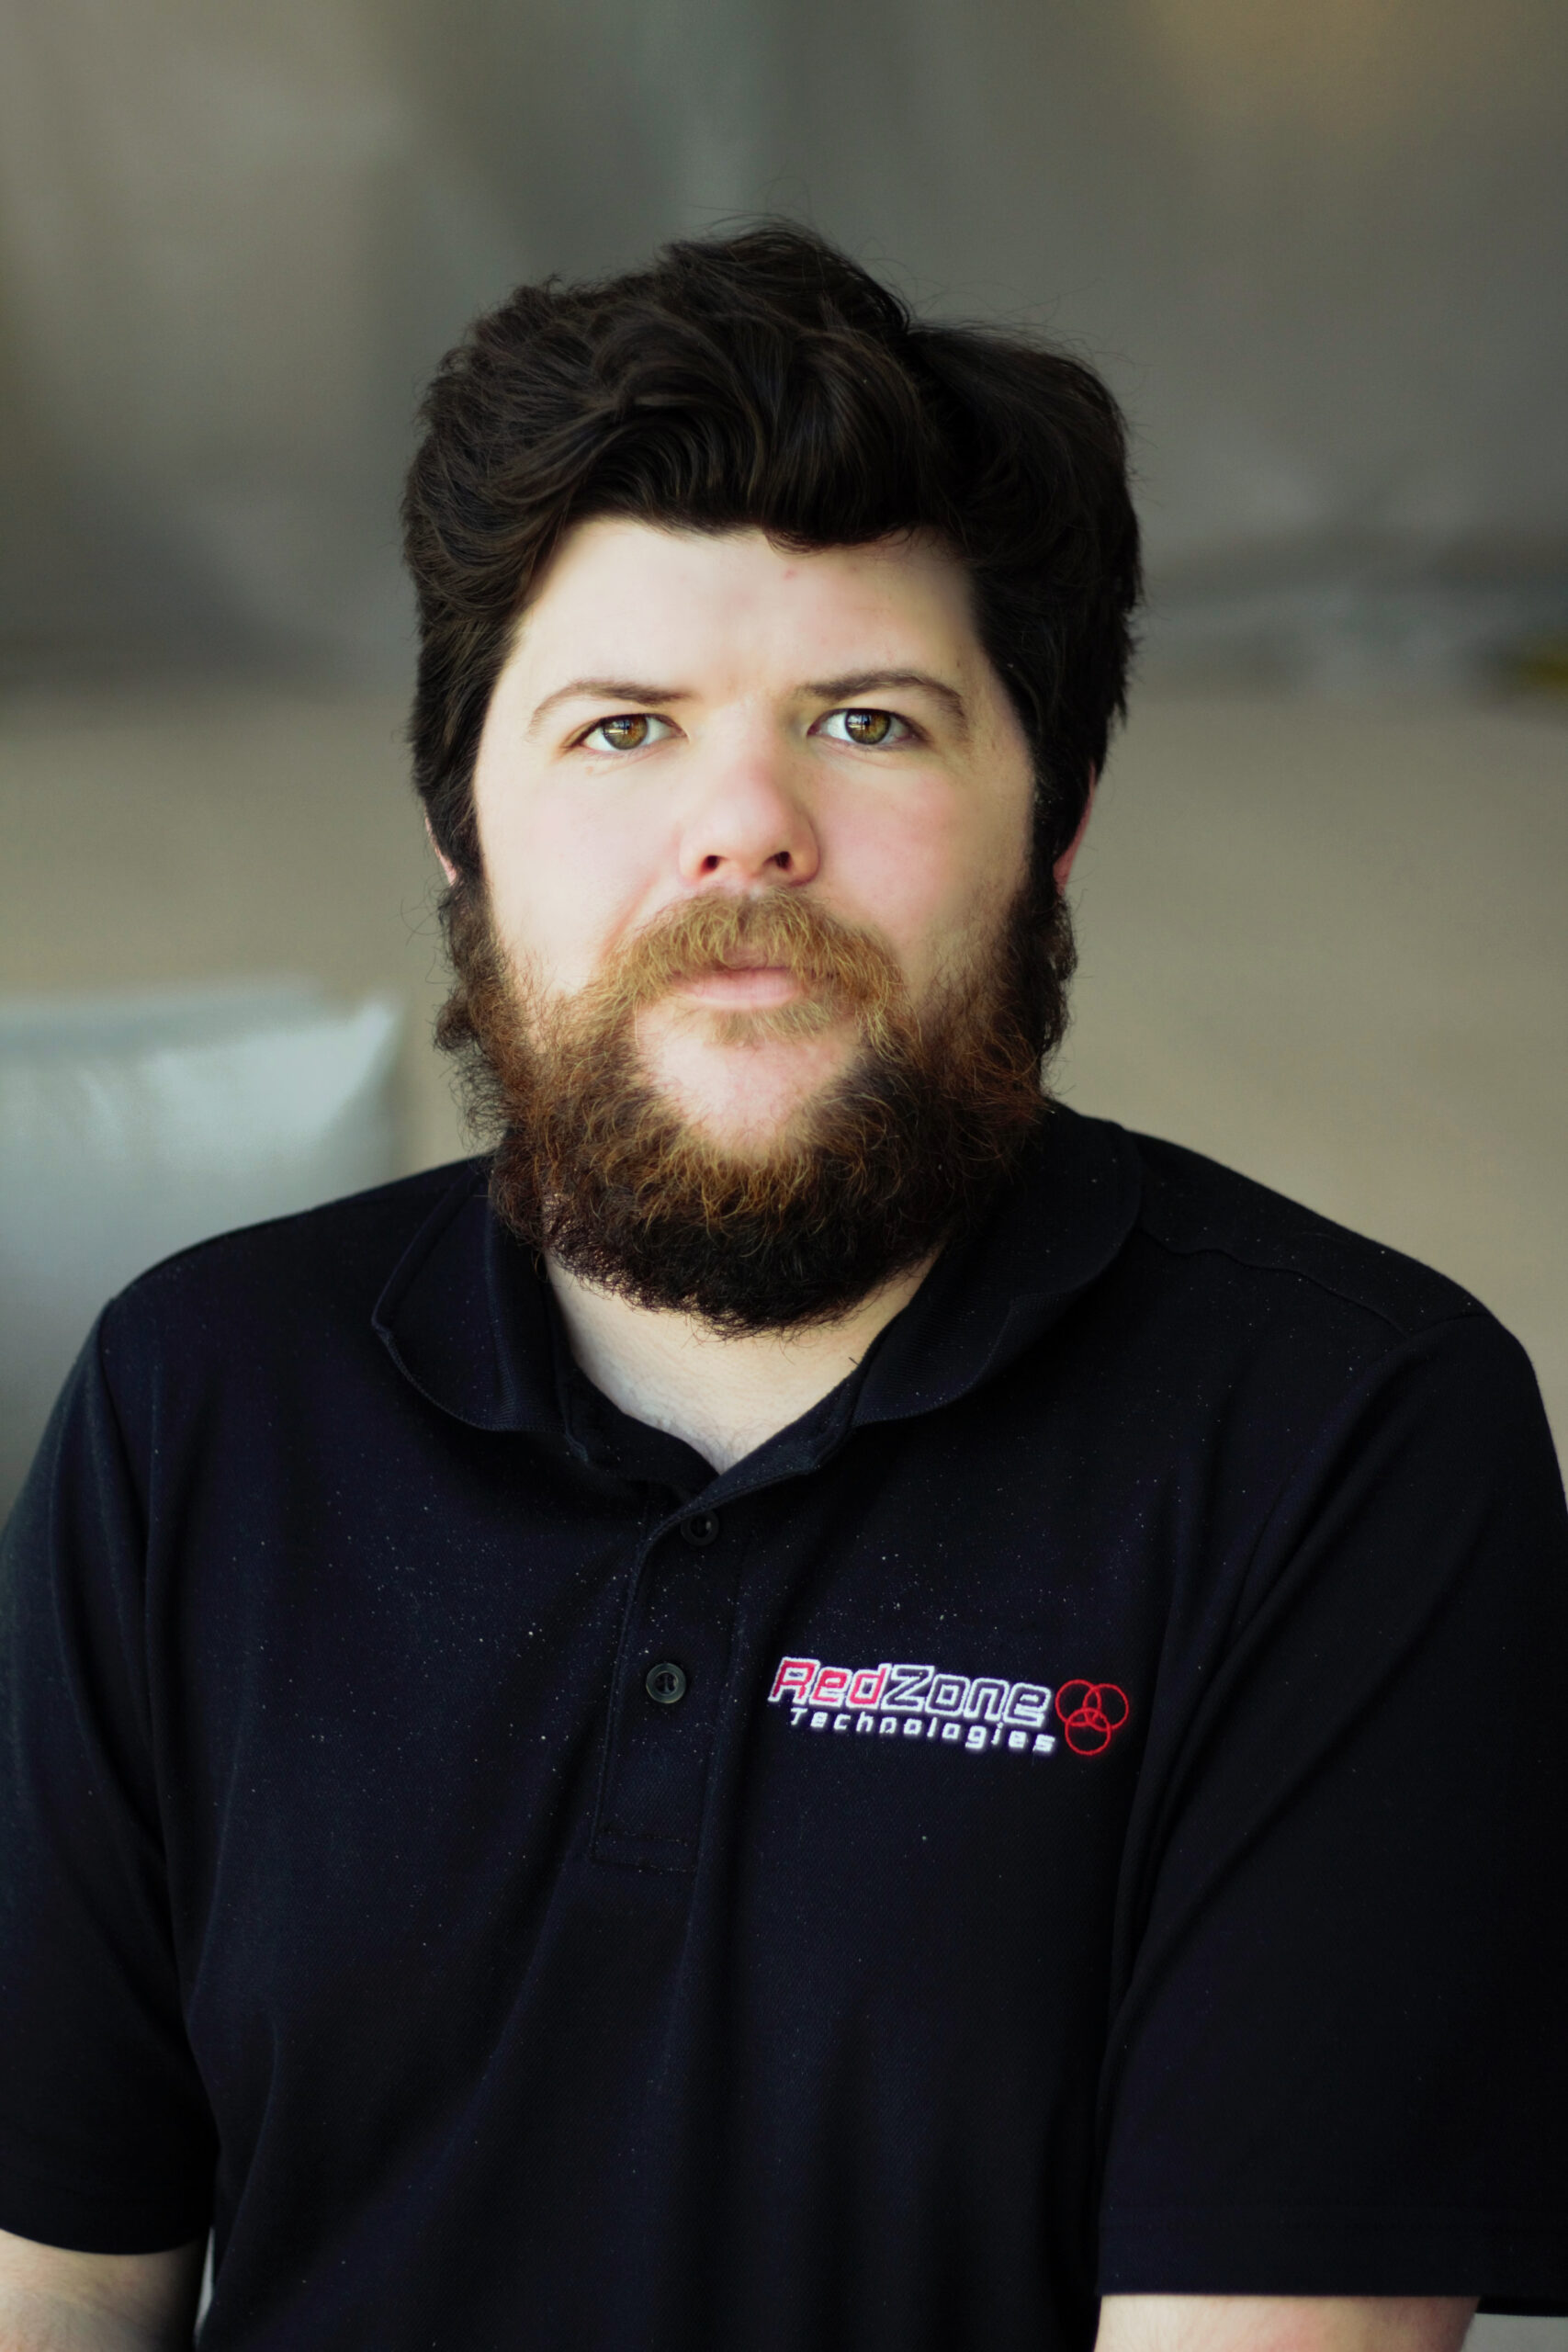 Patrick Headshot